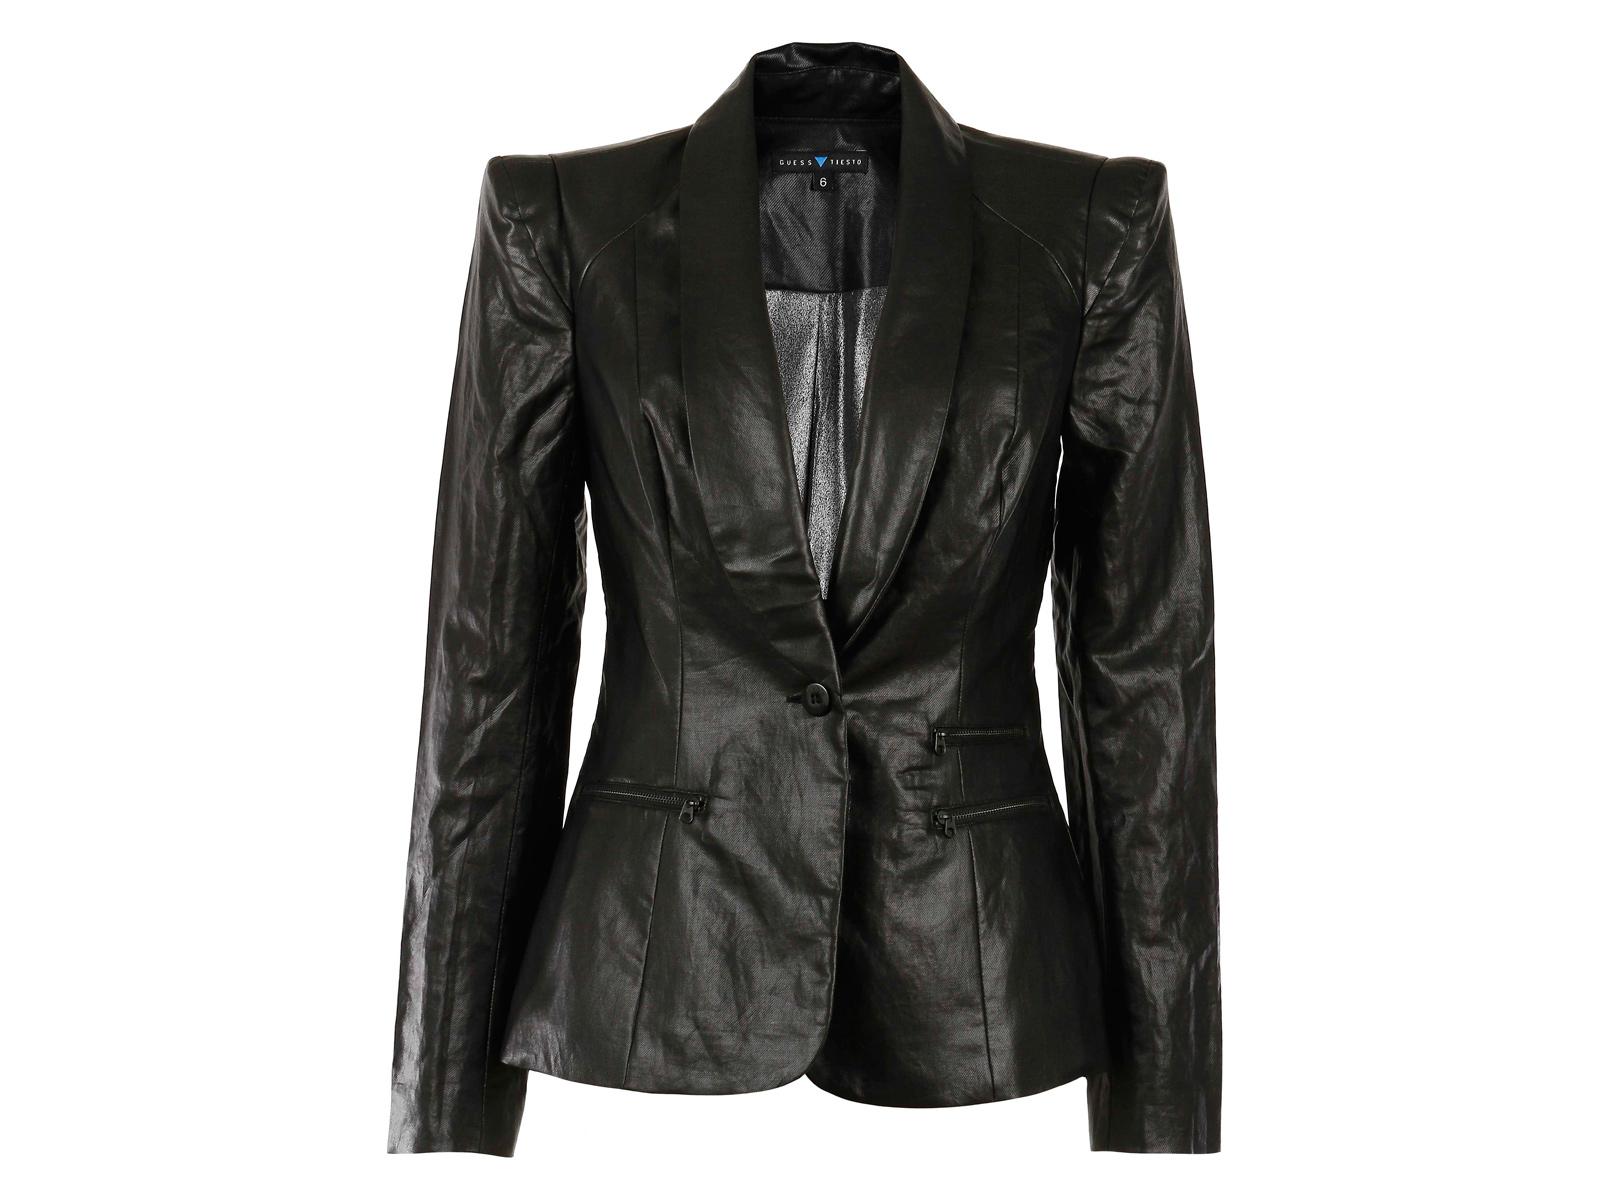 Куртка, Guess u2014 TIESTO COLLECTION  ТЦ Метрополис, Ленинградское шоссе, 16А цена 9 000 руб.